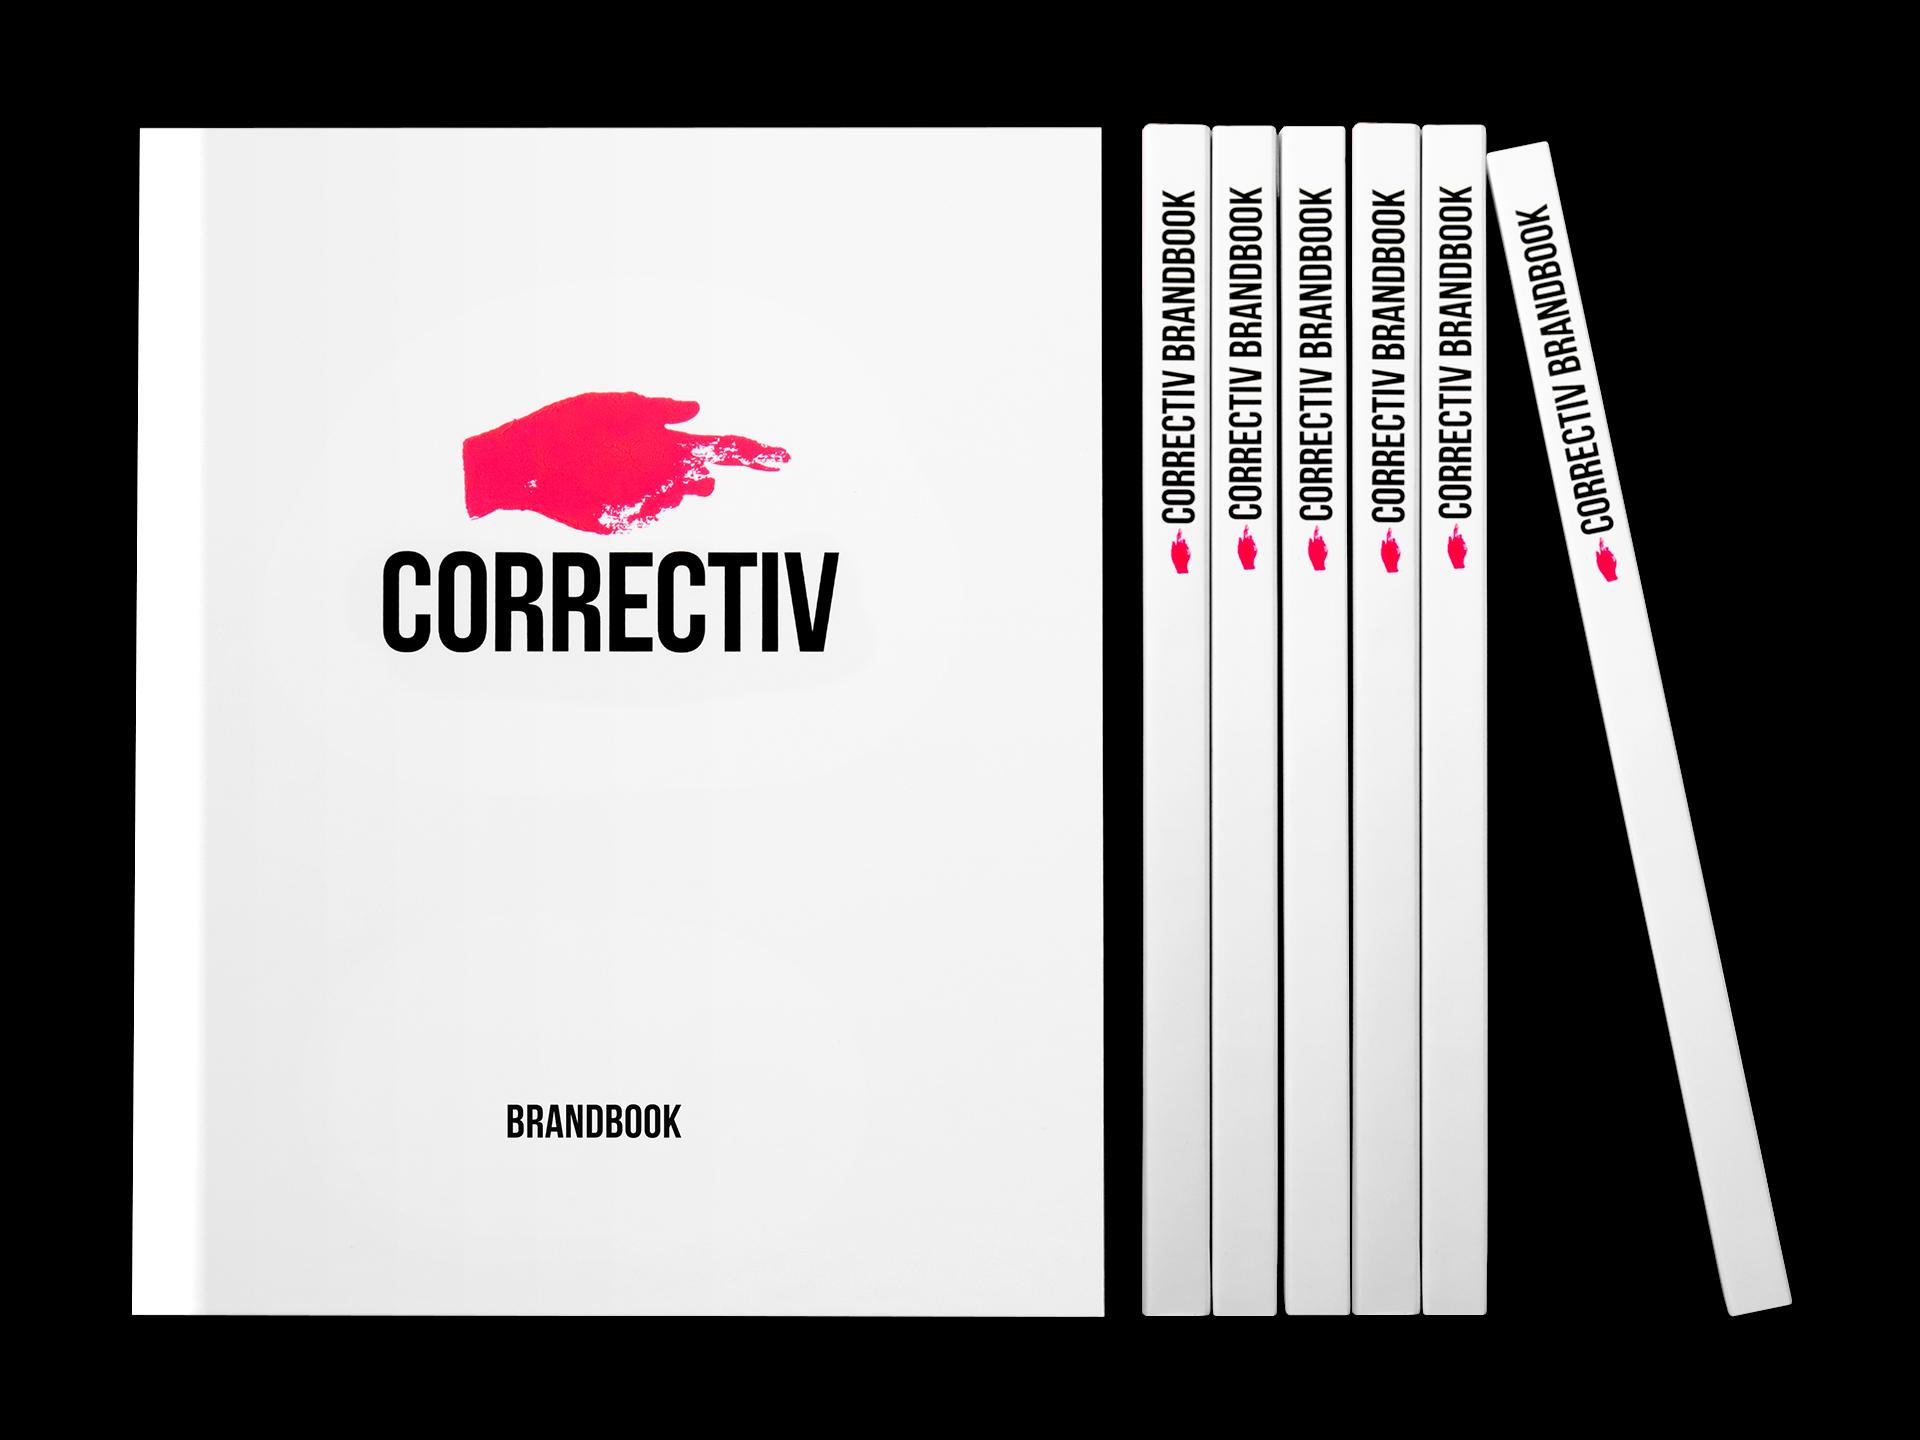 210407_Correctiv_Brandbook_4zu3